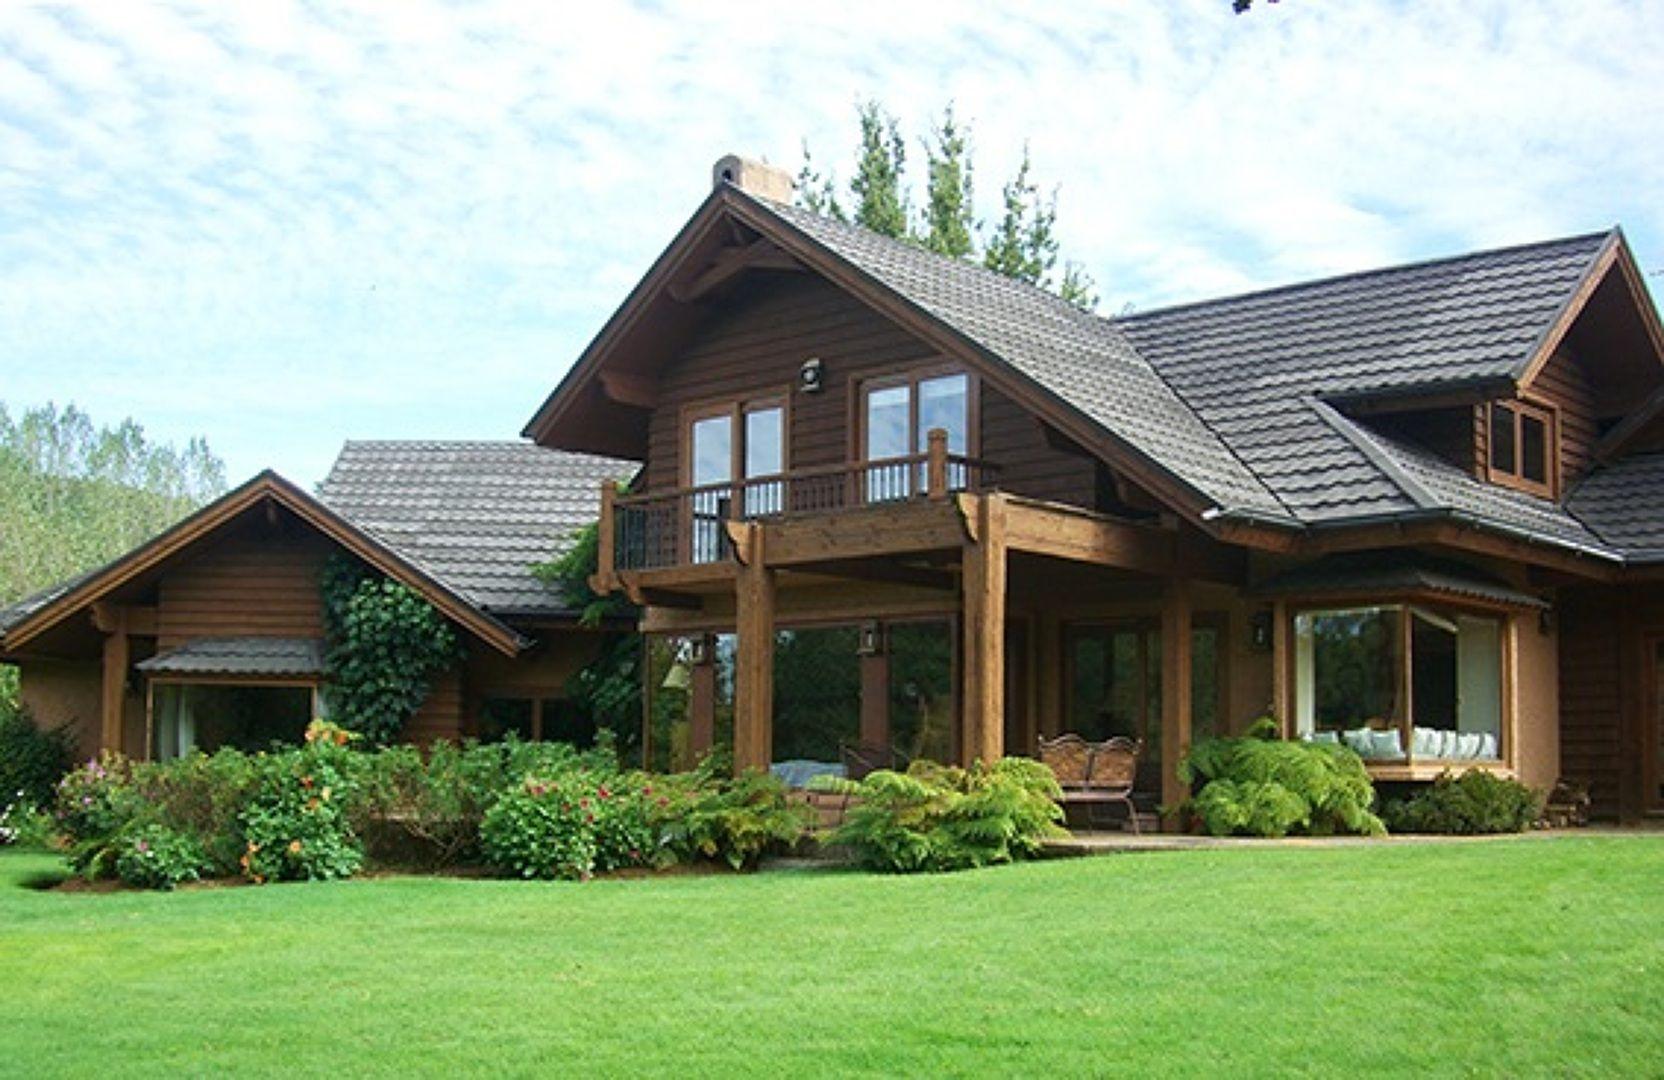 Casa de campo madera pinterest casa de campo de for Casas de campo prefabricadas